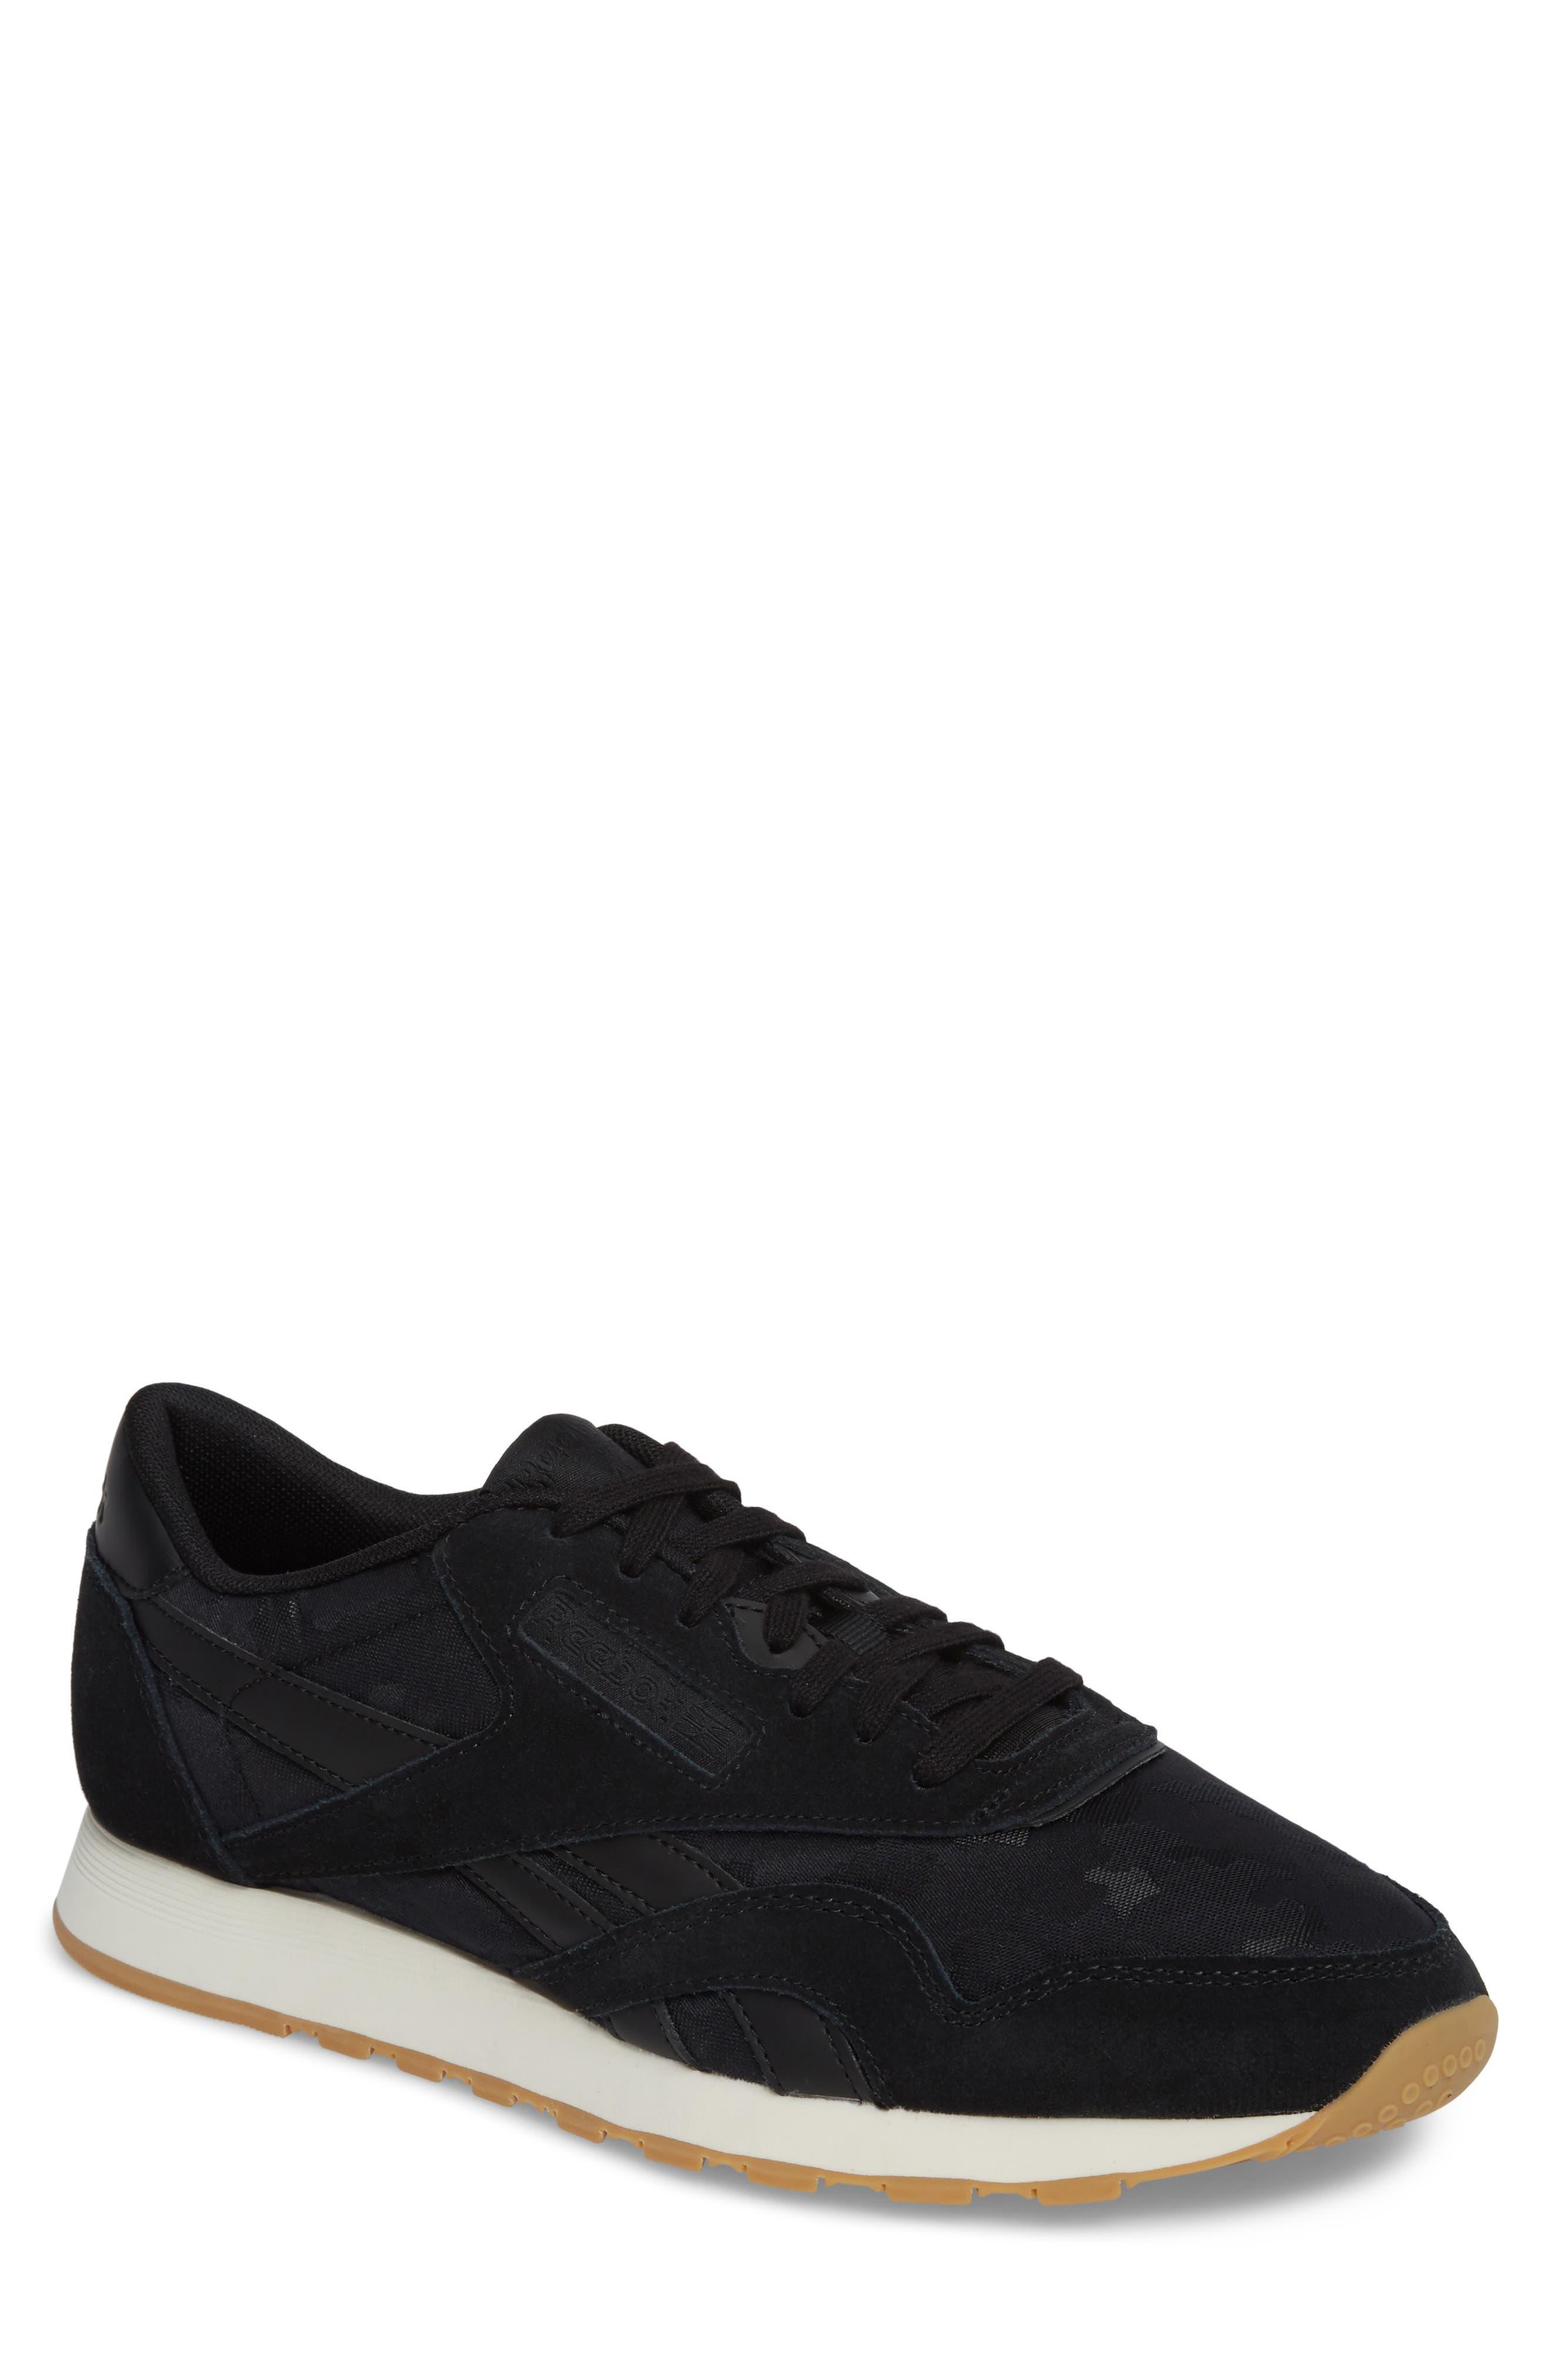 Classic Leather Nylon SG Sneaker,                             Main thumbnail 1, color,                             001